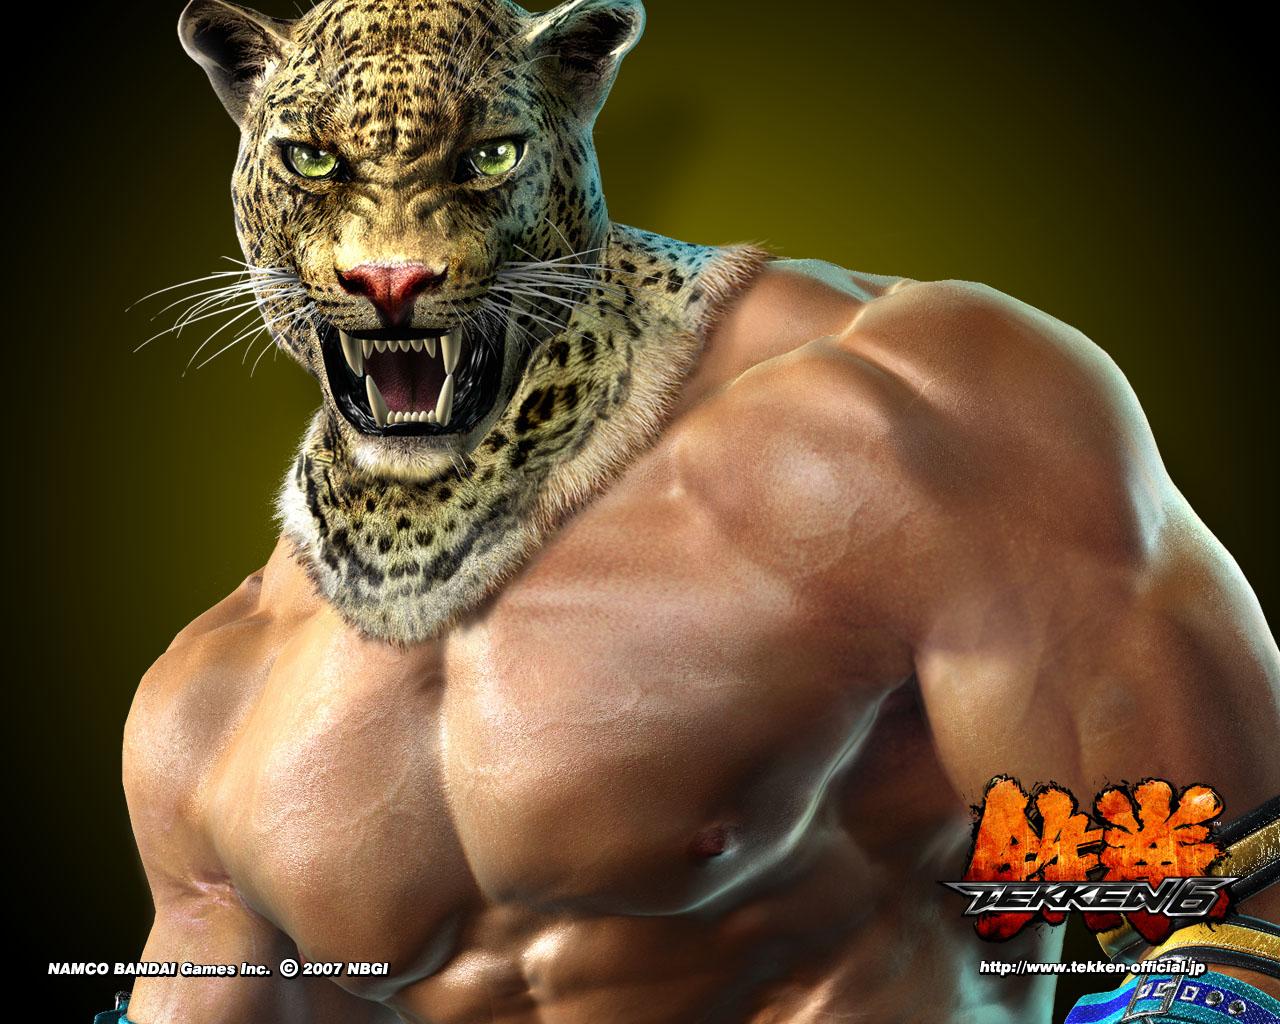 King Tekken 6 Wallpapers HD Wallpapers 1280x1024